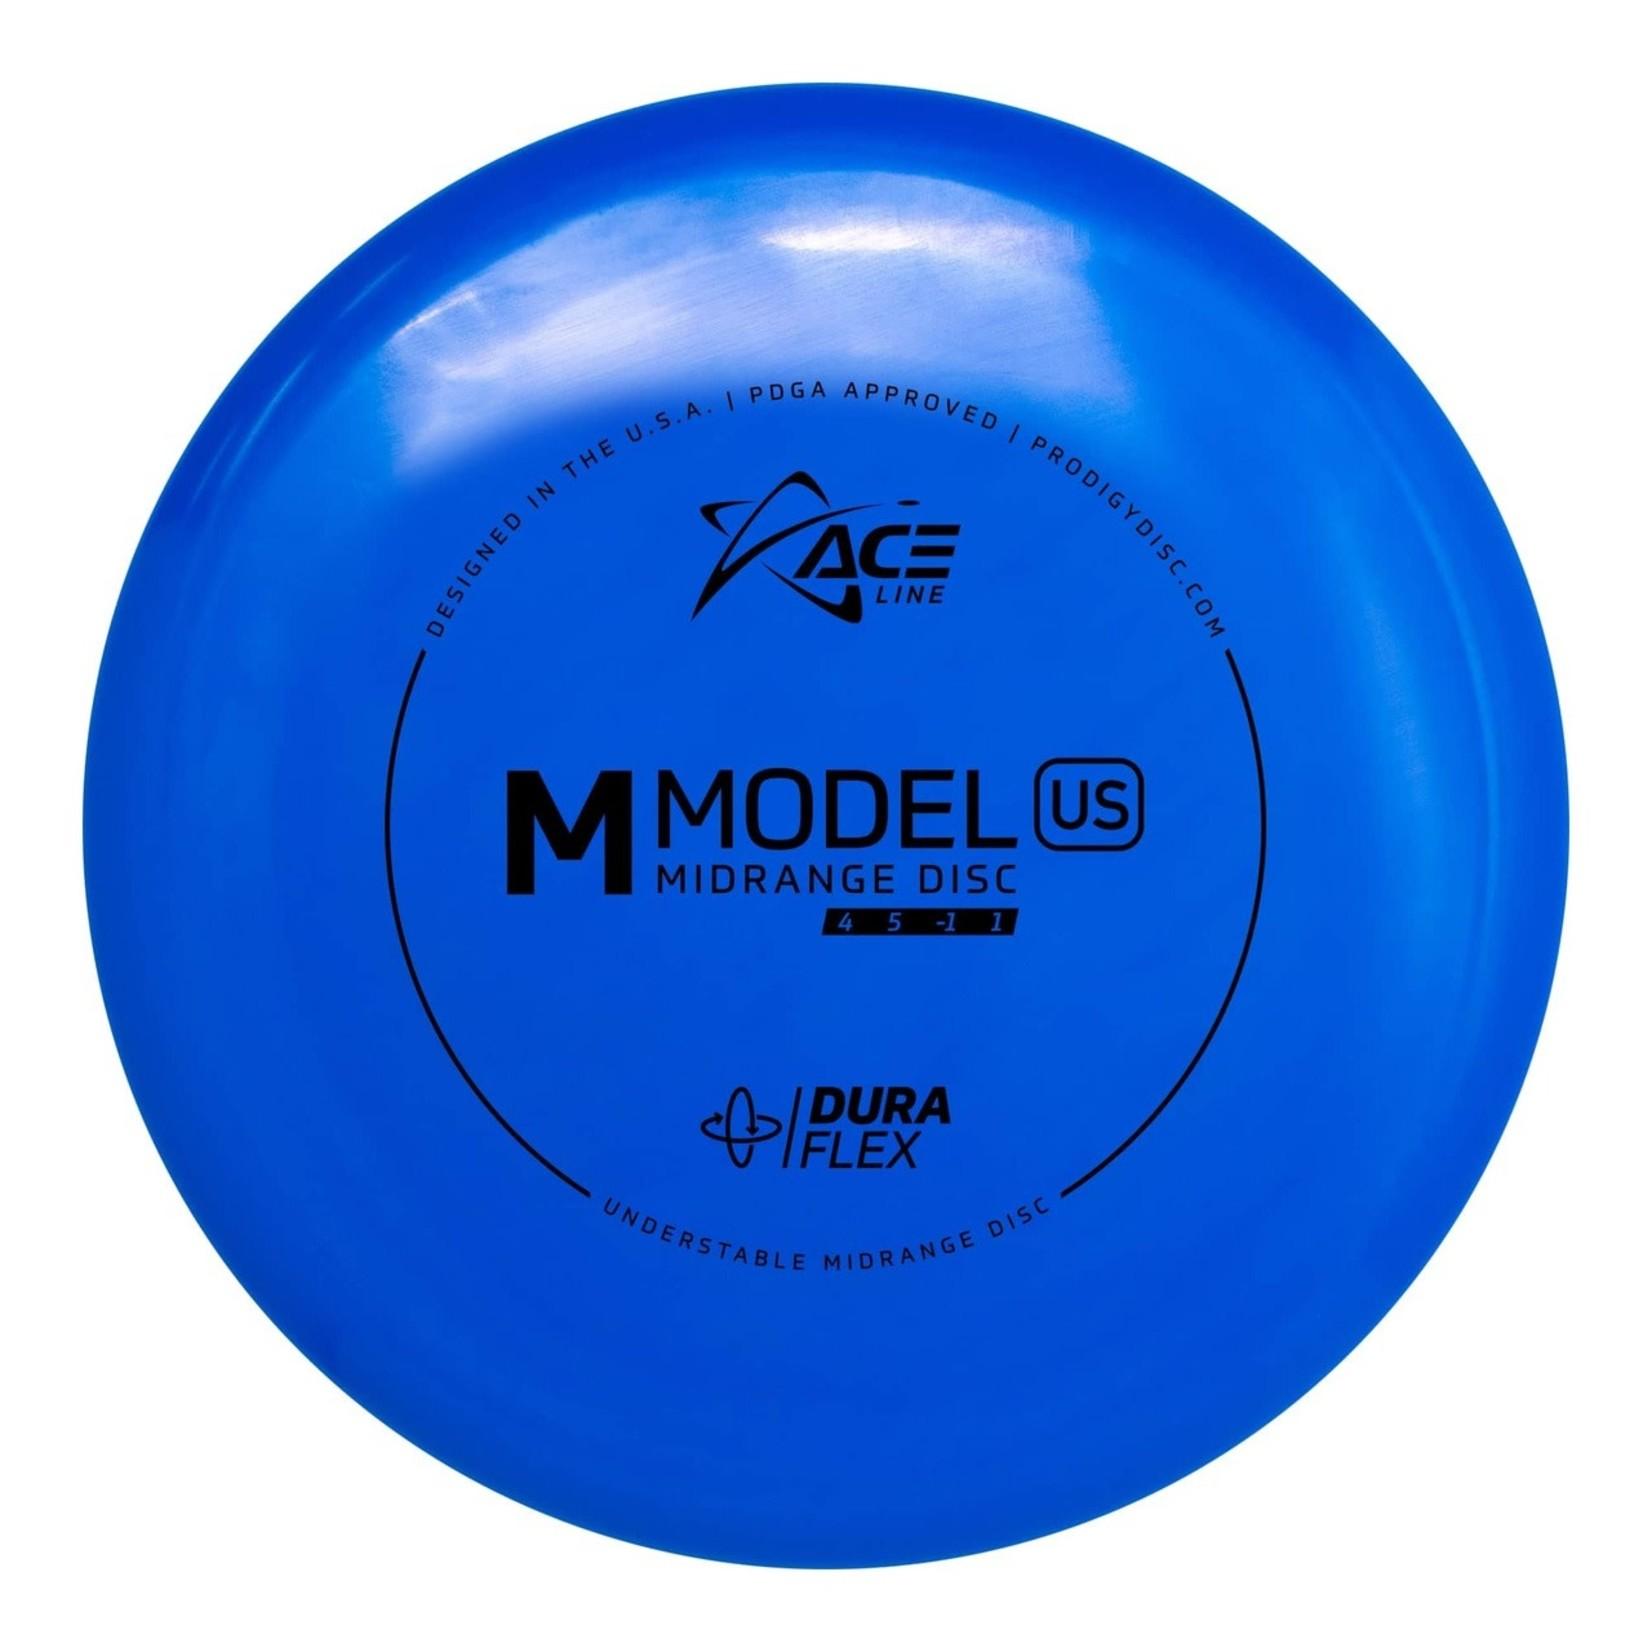 Prodigy Prodigy Disc, Ace Line Midrange-US-Duraflex, ACE-M-DF-US-180